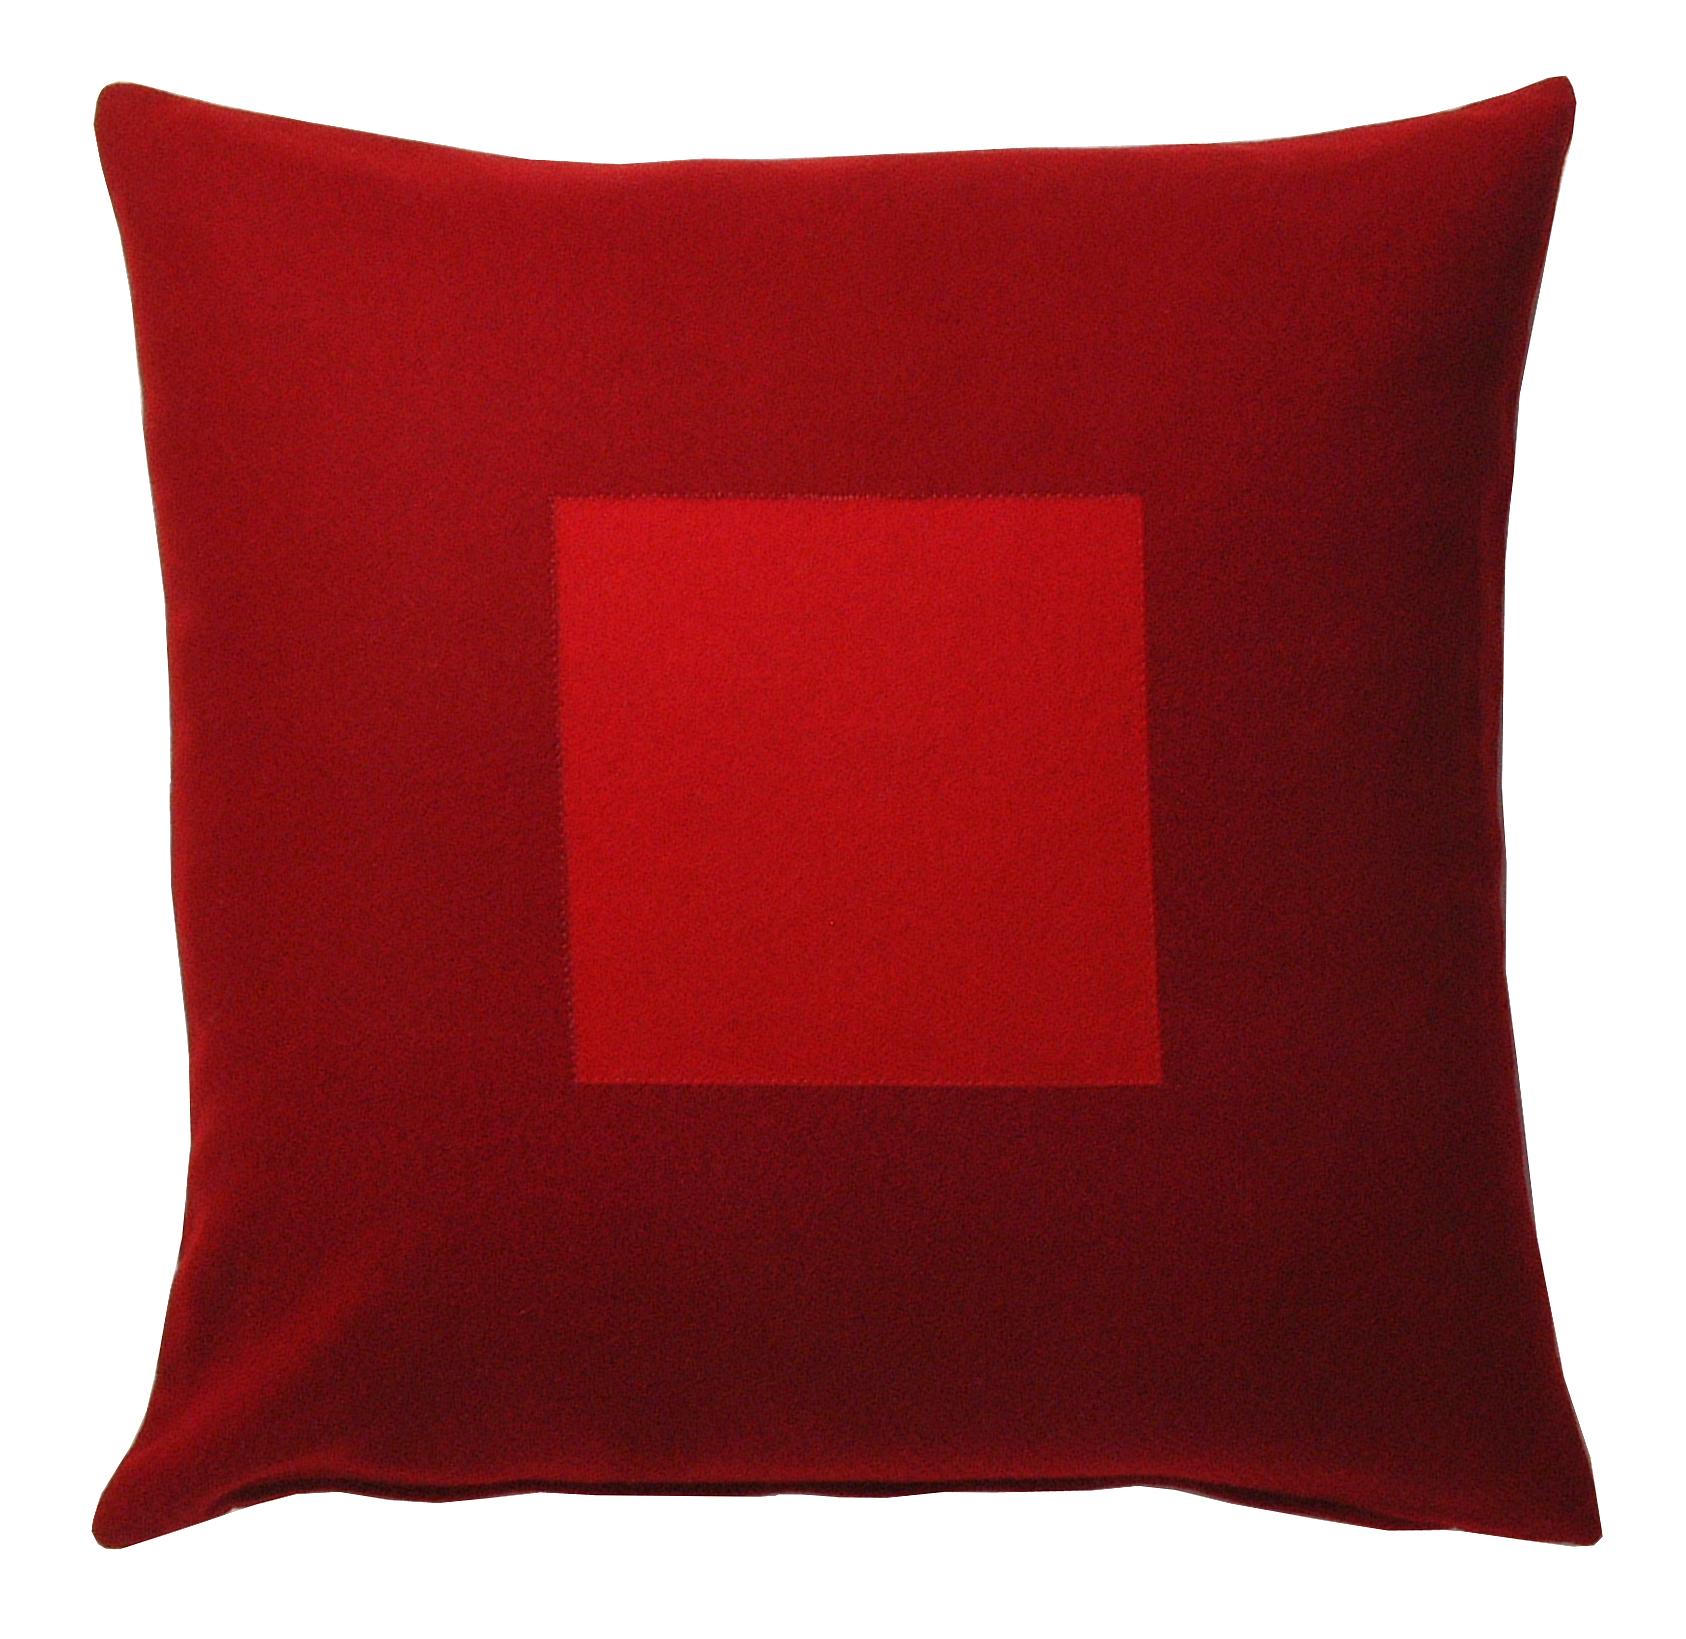 50 Kvadrat kuddfodral Vinröd Röd 319 kr Trendrum se